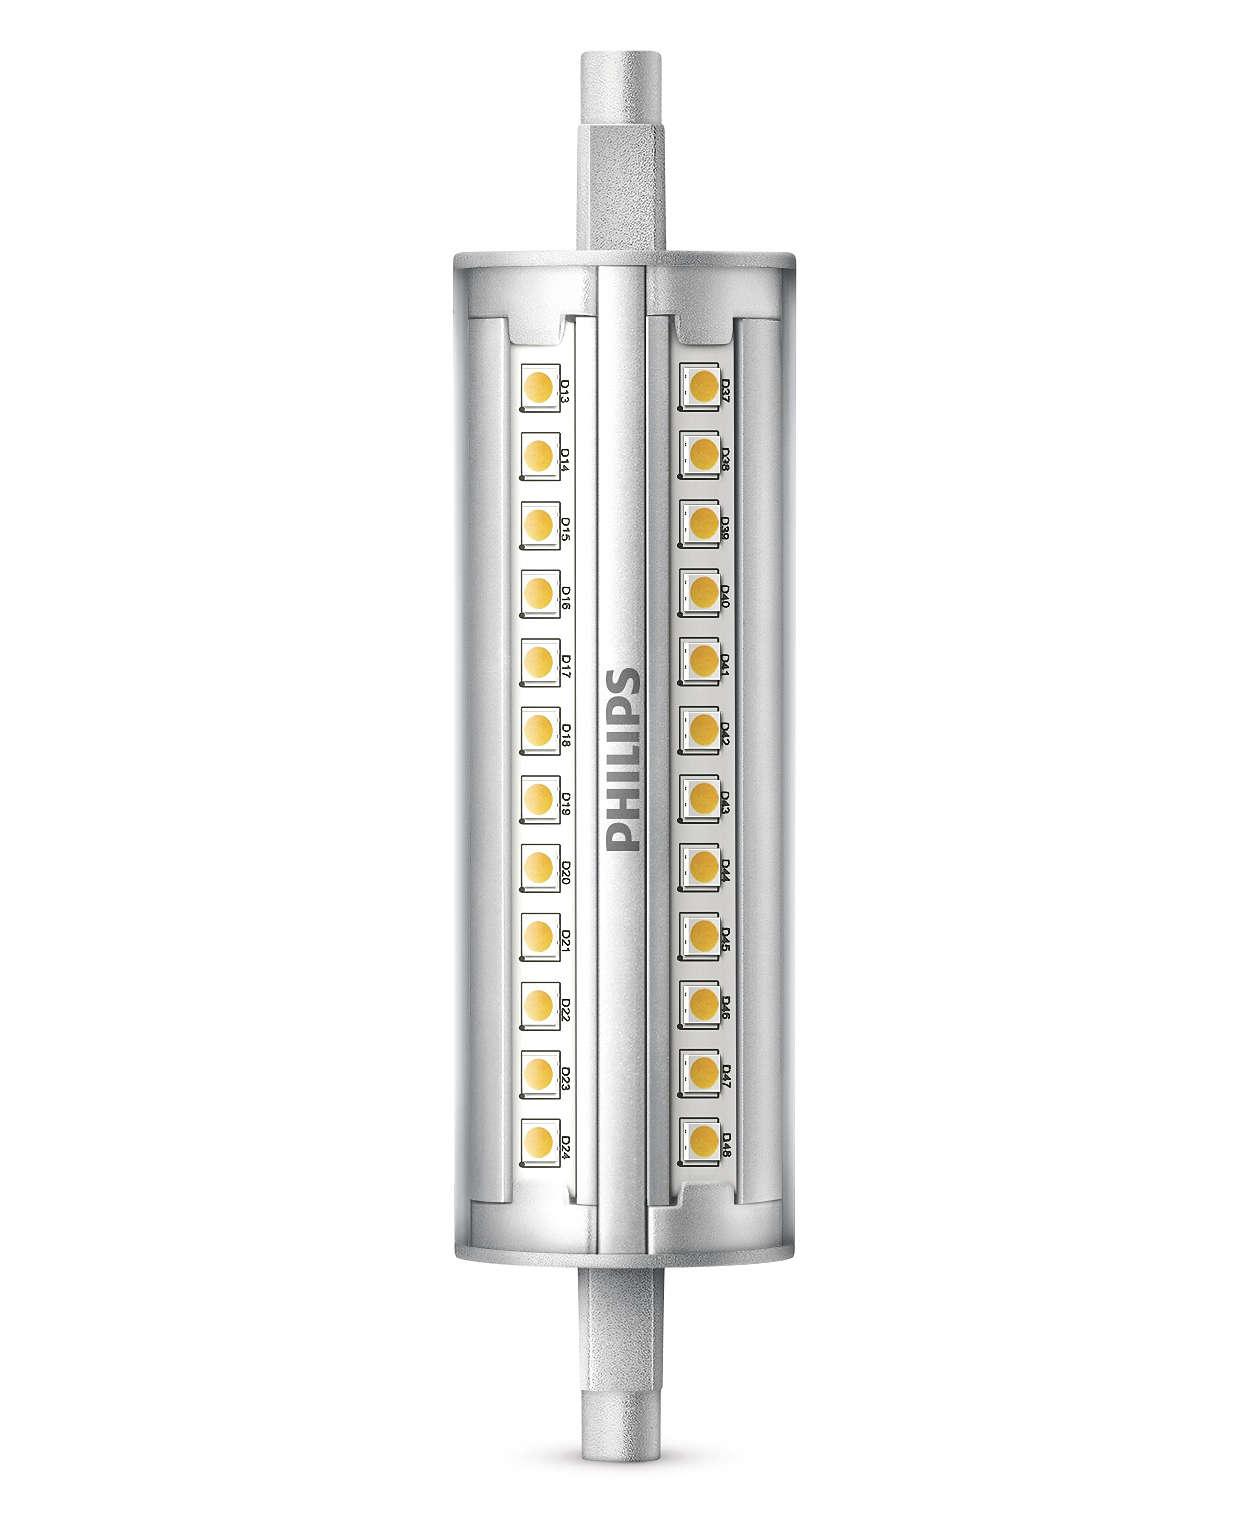 Langlebiges LED-Licht mit einem 300-Grad-Strahl